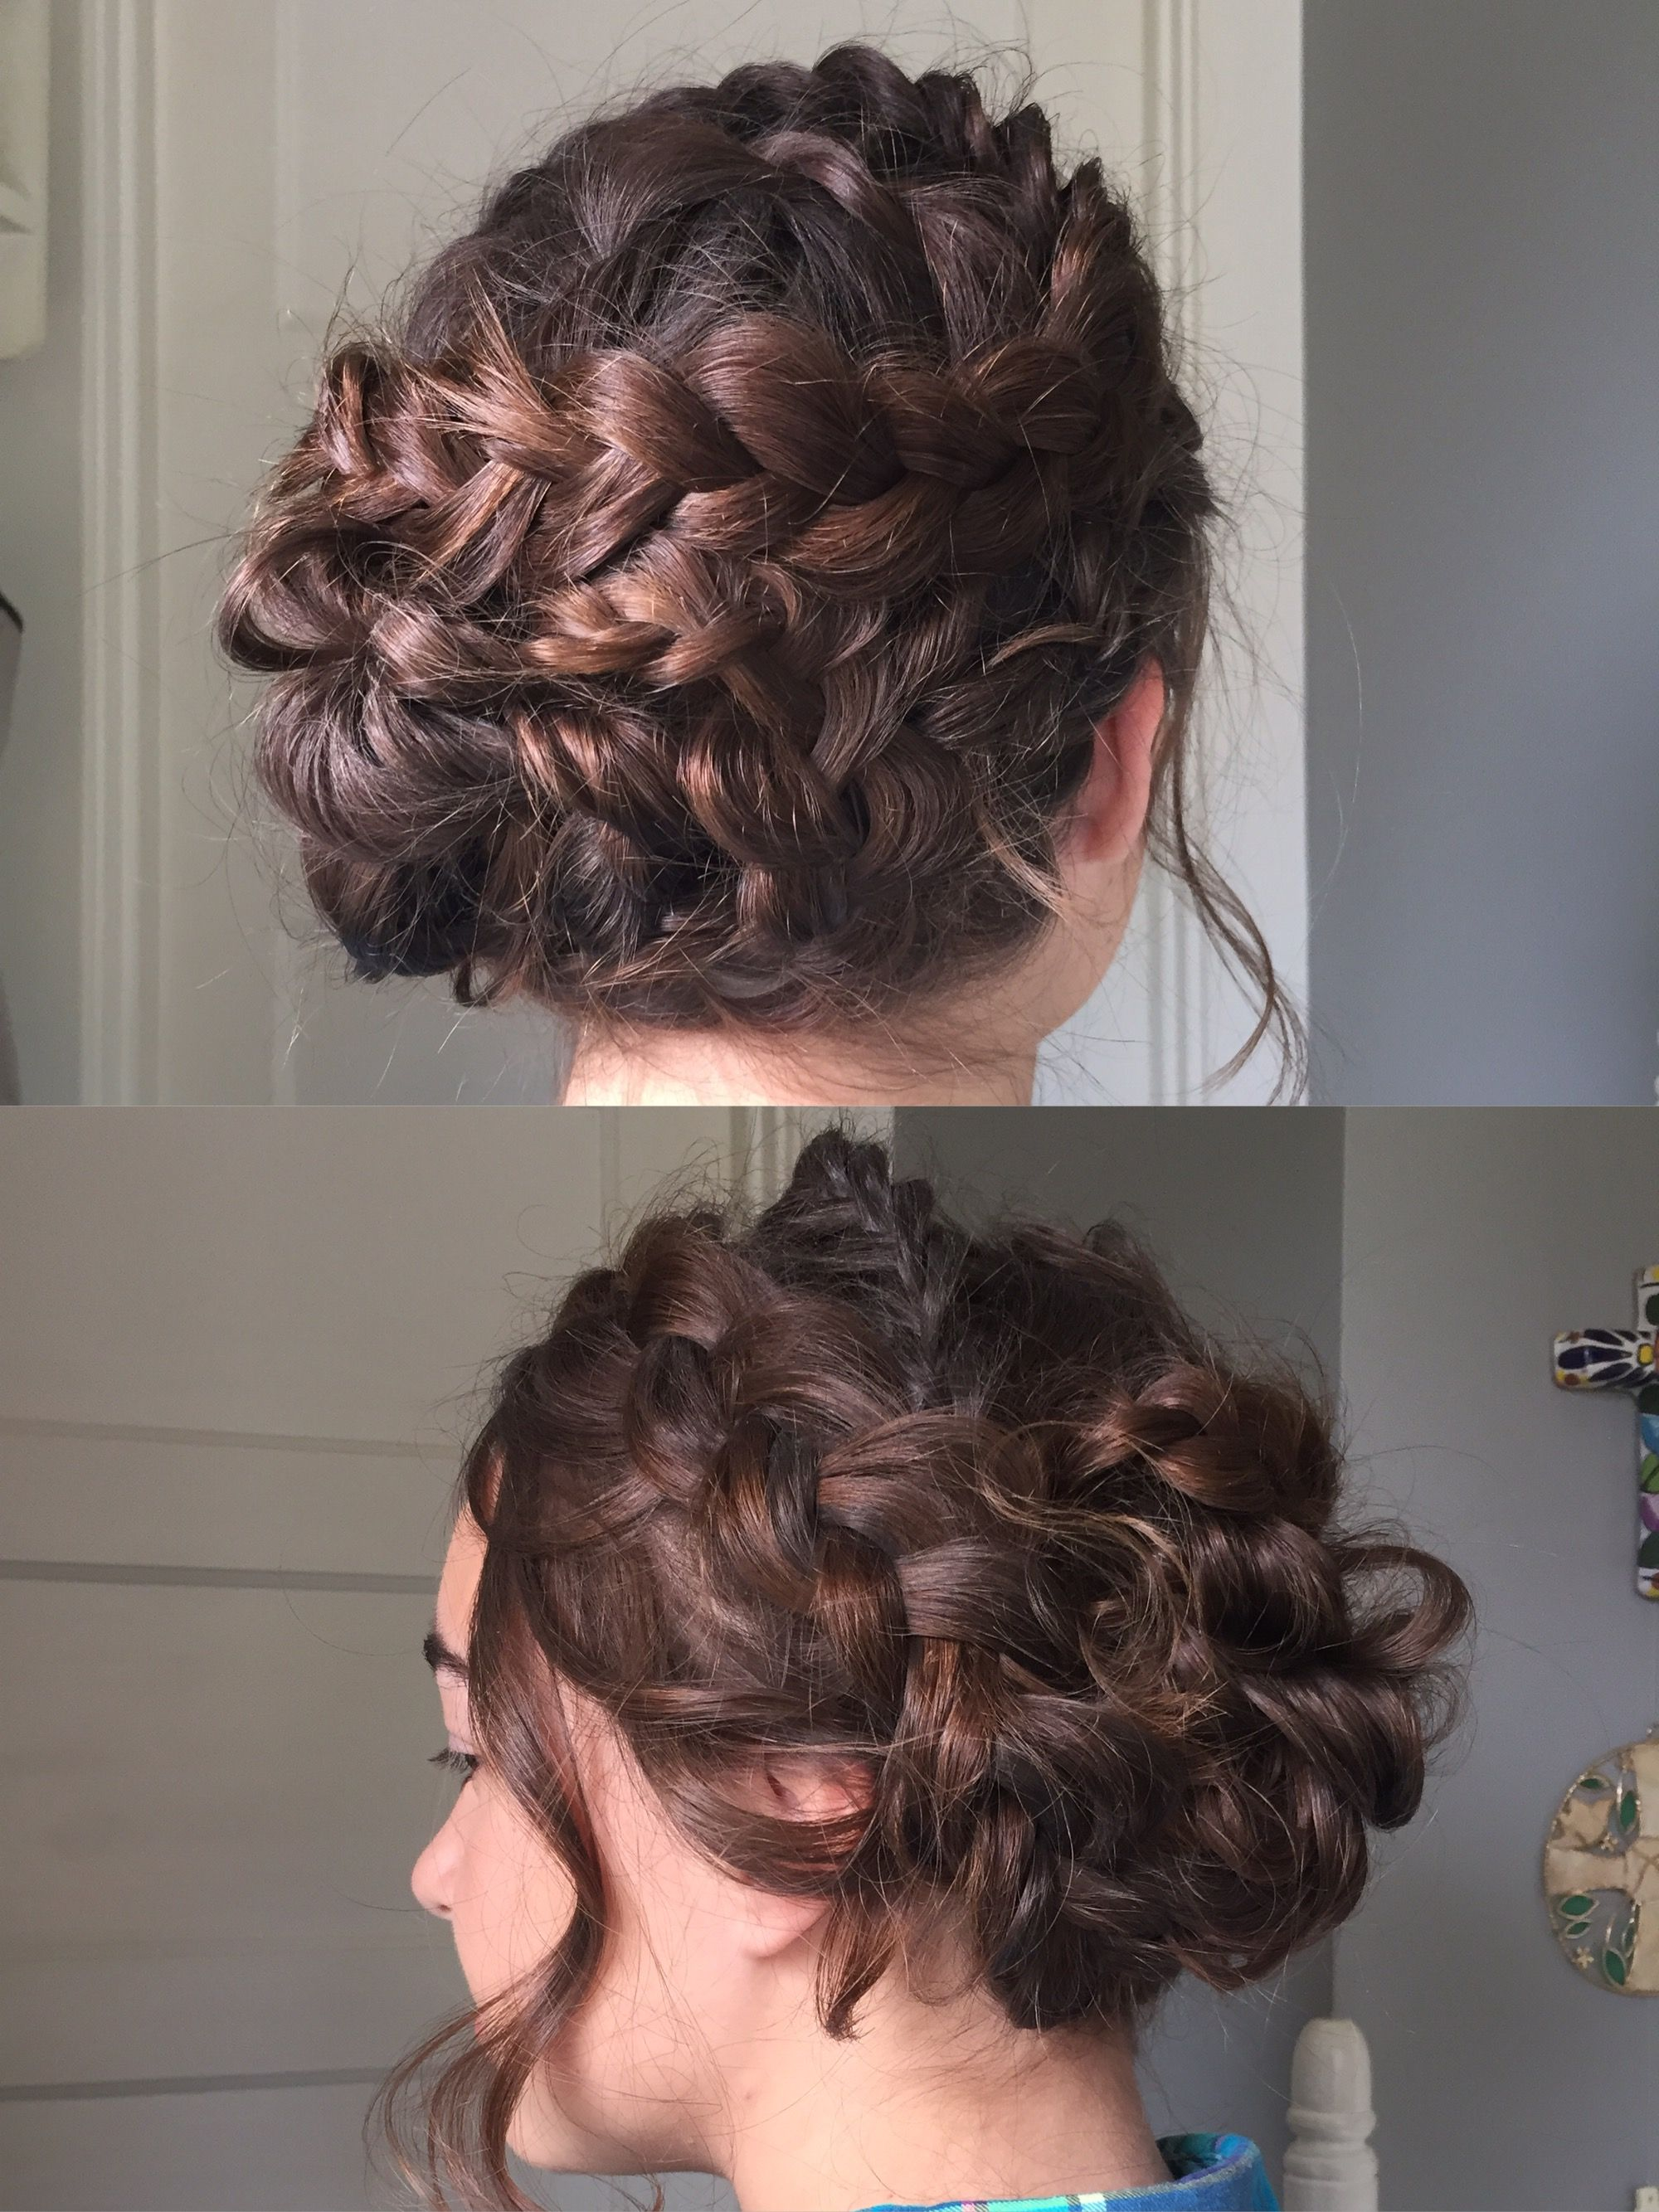 crown braids prom hair//natalie stalter | Braided prom ...